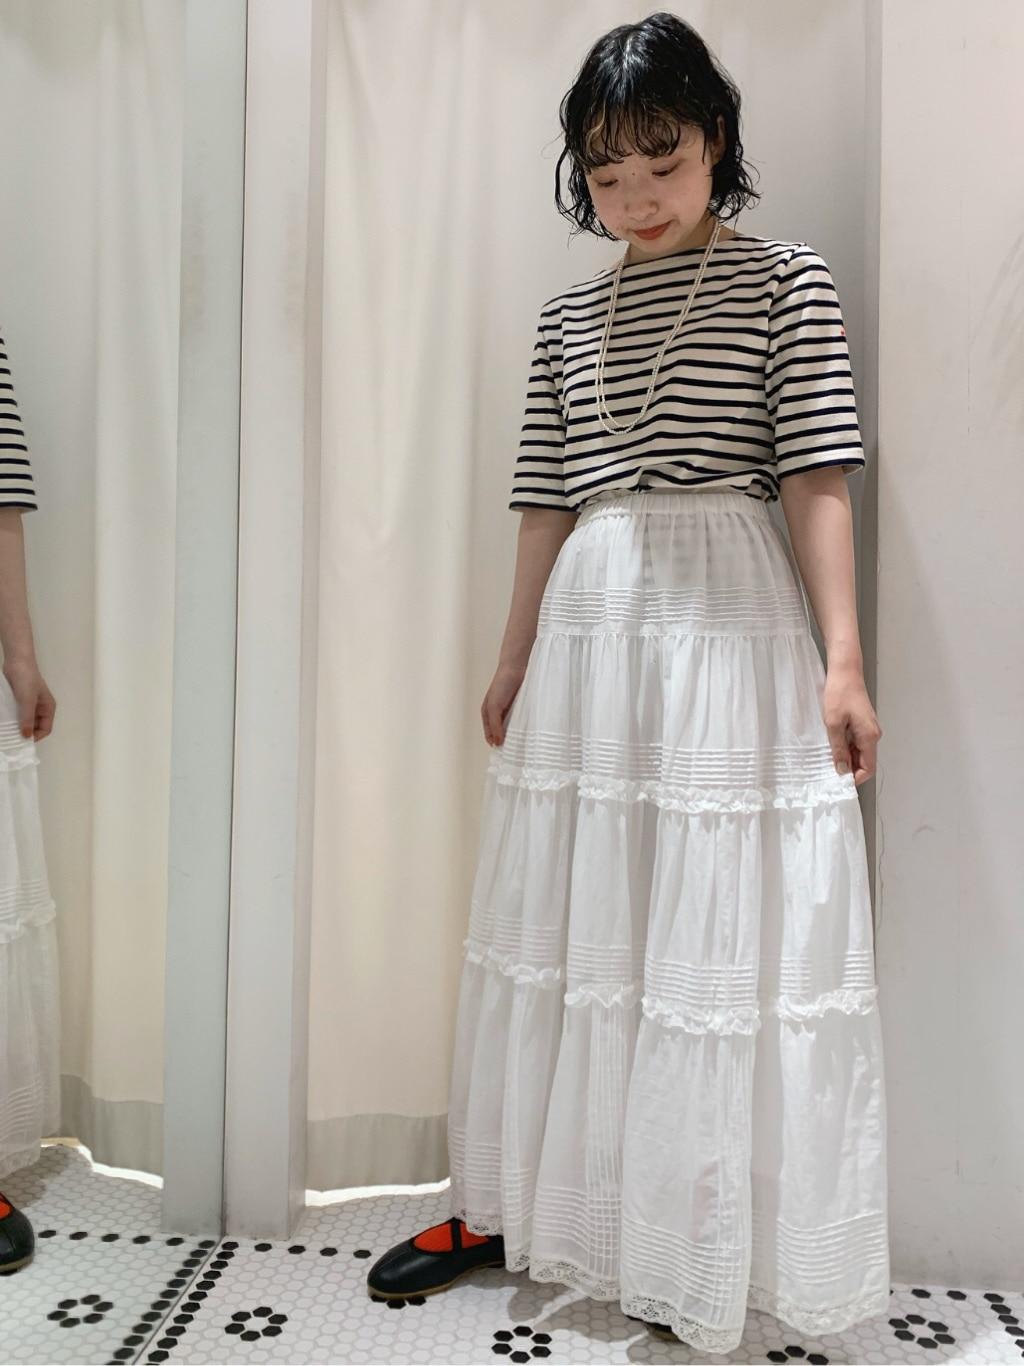 AMB SHOP CHILD WOMAN CHILD WOMAN , PAR ICI ルミネ横浜 身長:158cm 2020.06.29